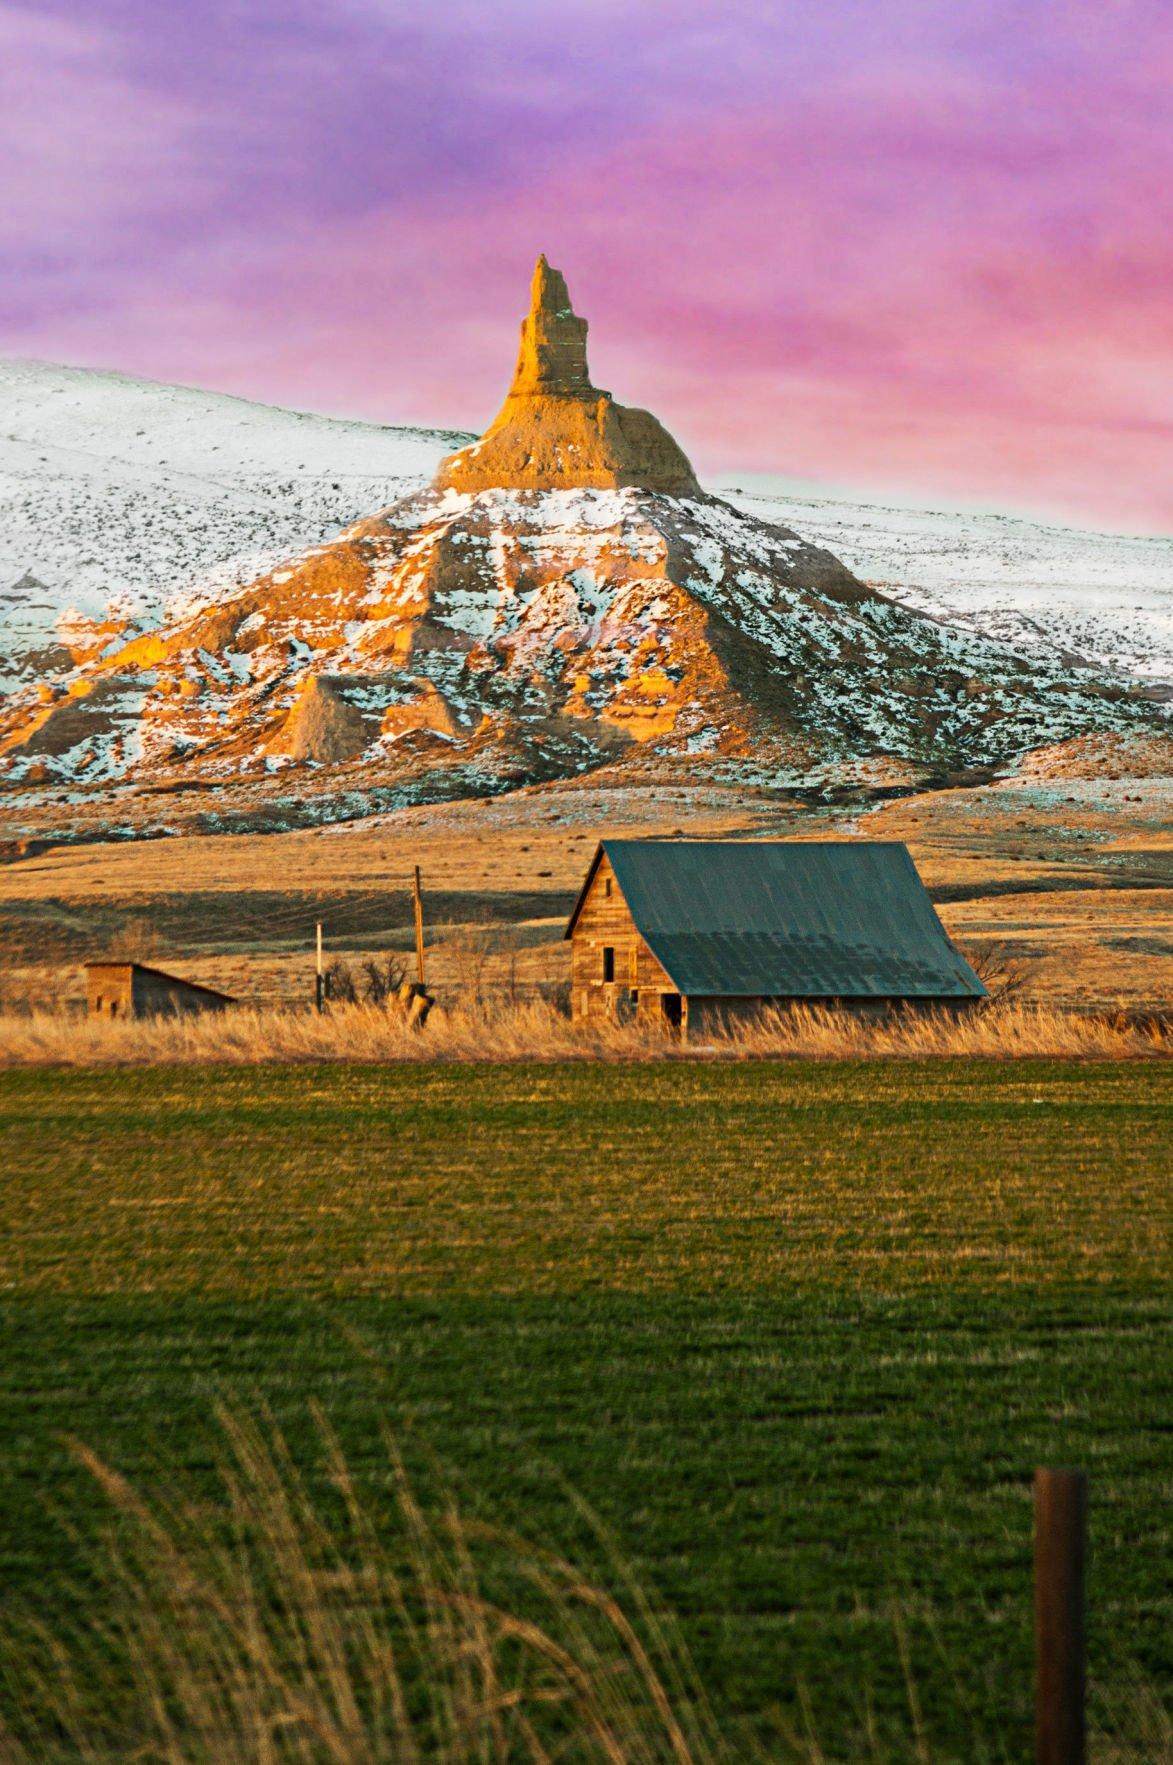 Another year, another 365 photos of Chimney Rock | Nebraska News | journalstar.com